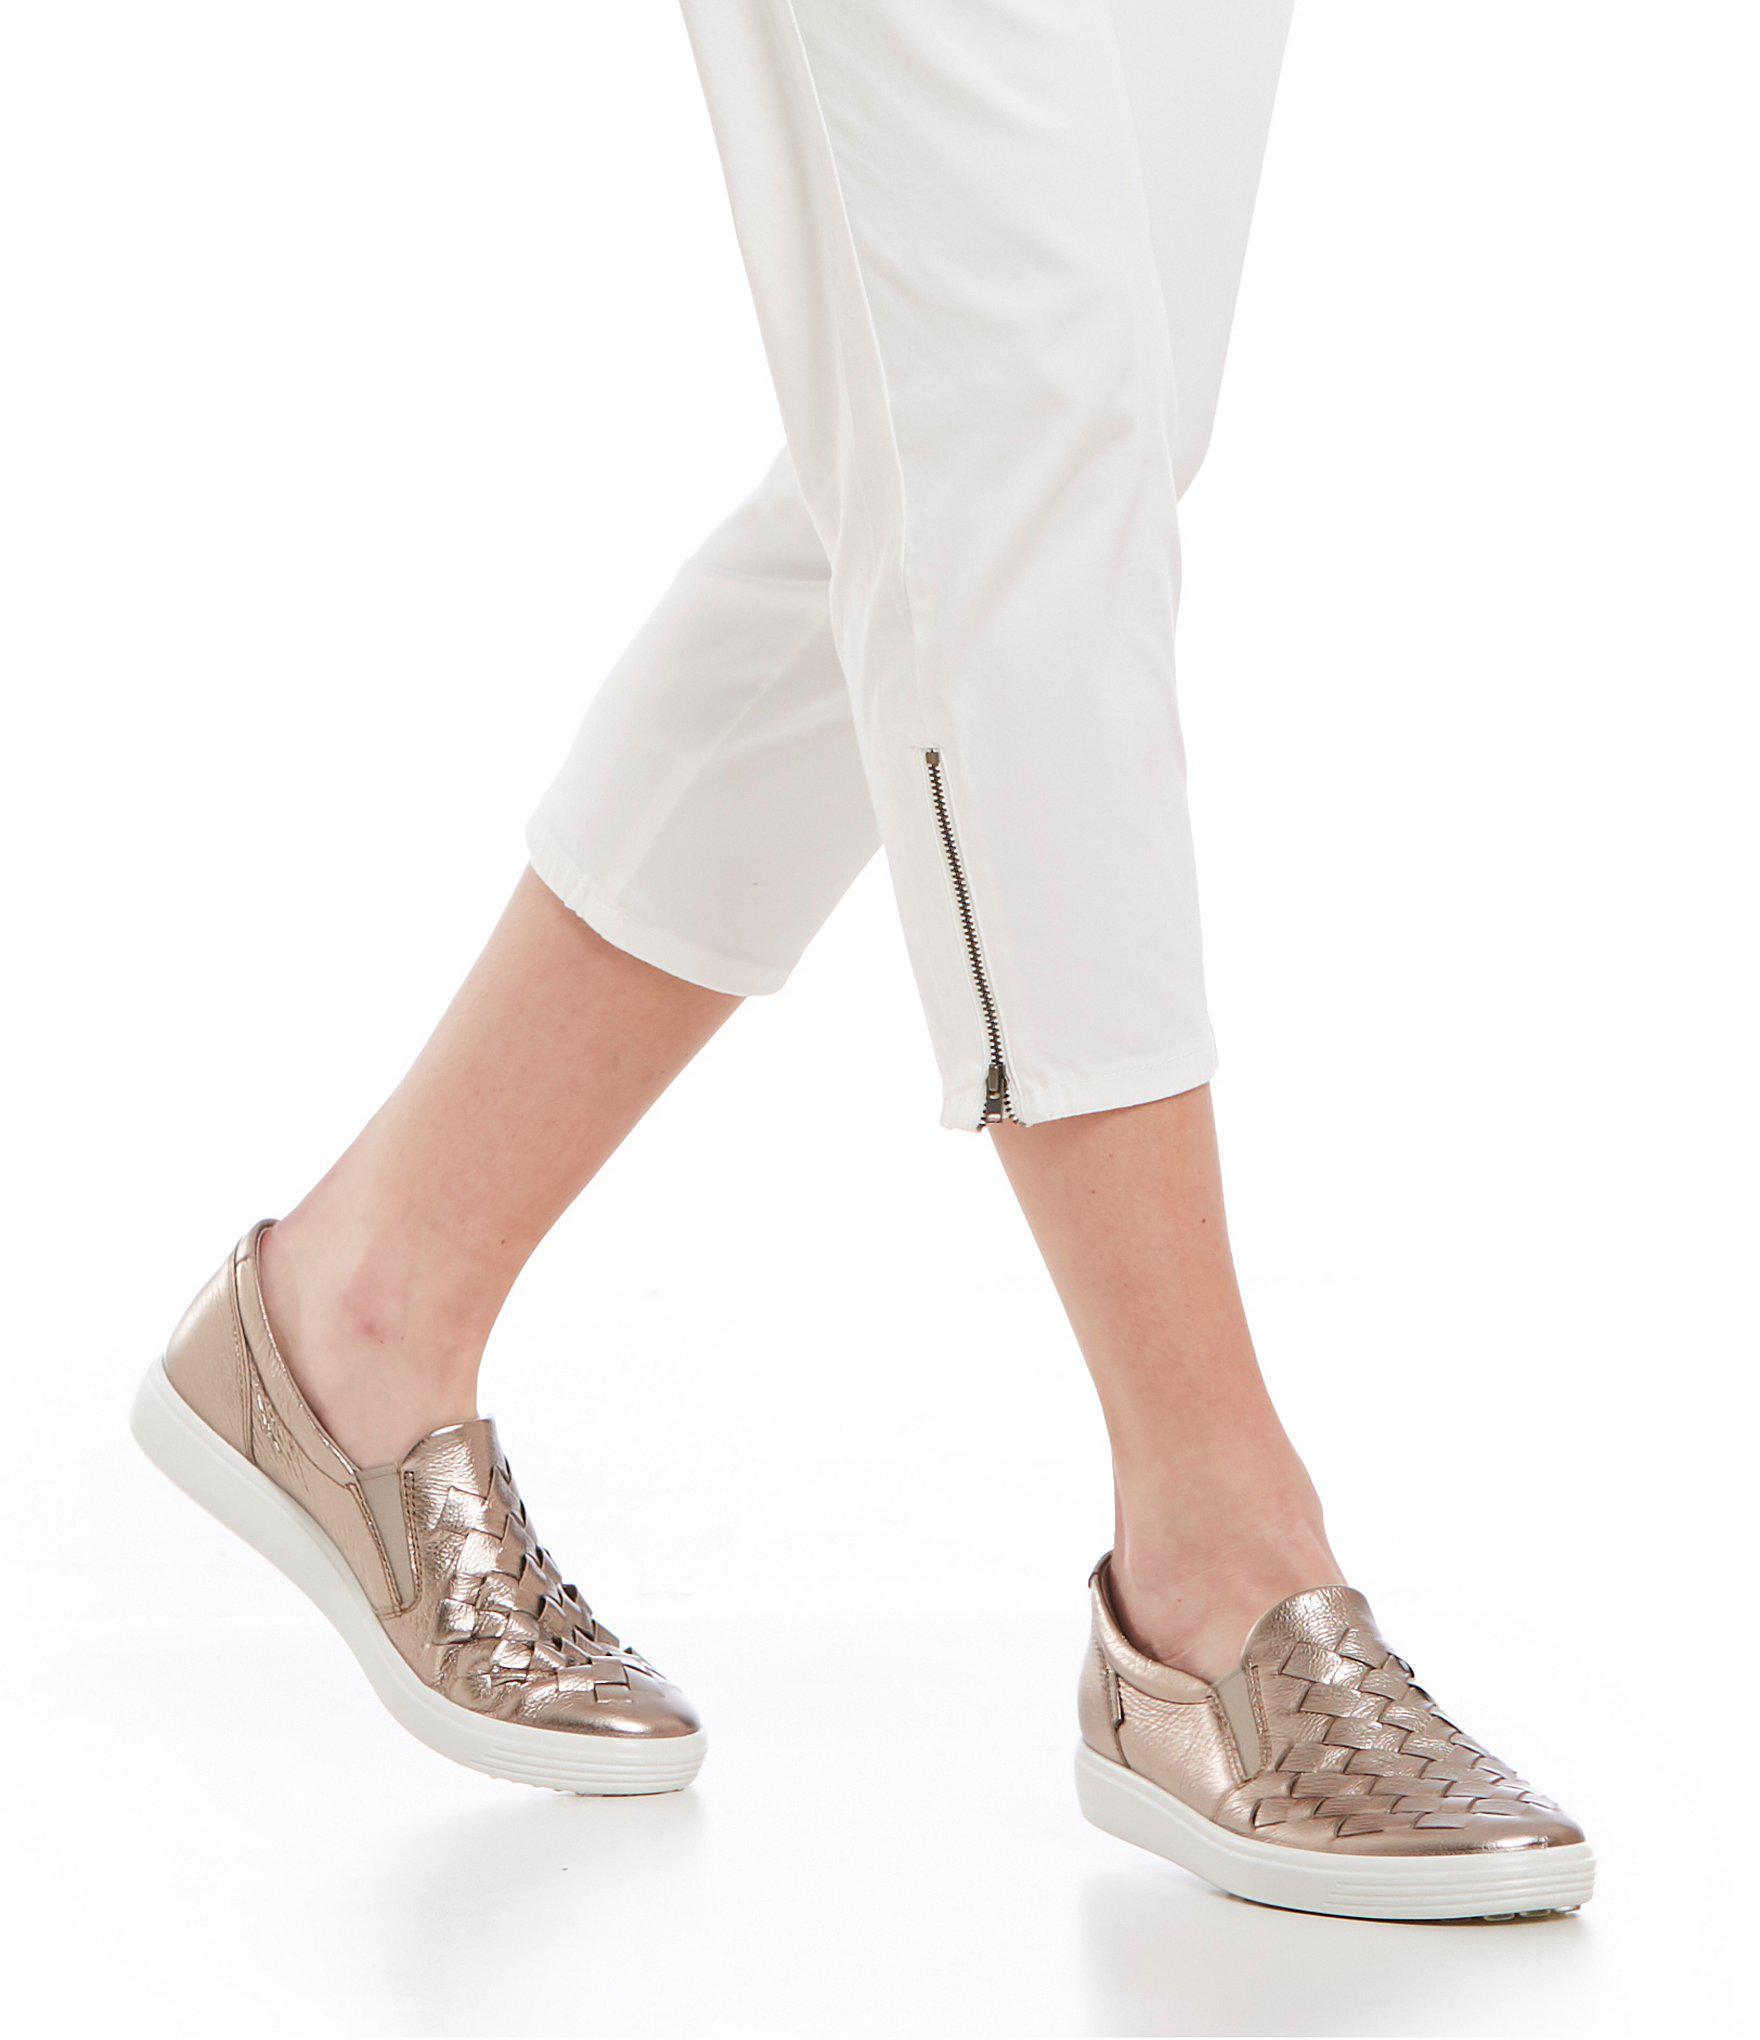 6bea88c4dcfb Ecco - Black Women s Soft 7 Woven Slip-on Sneakers - Lyst. View fullscreen